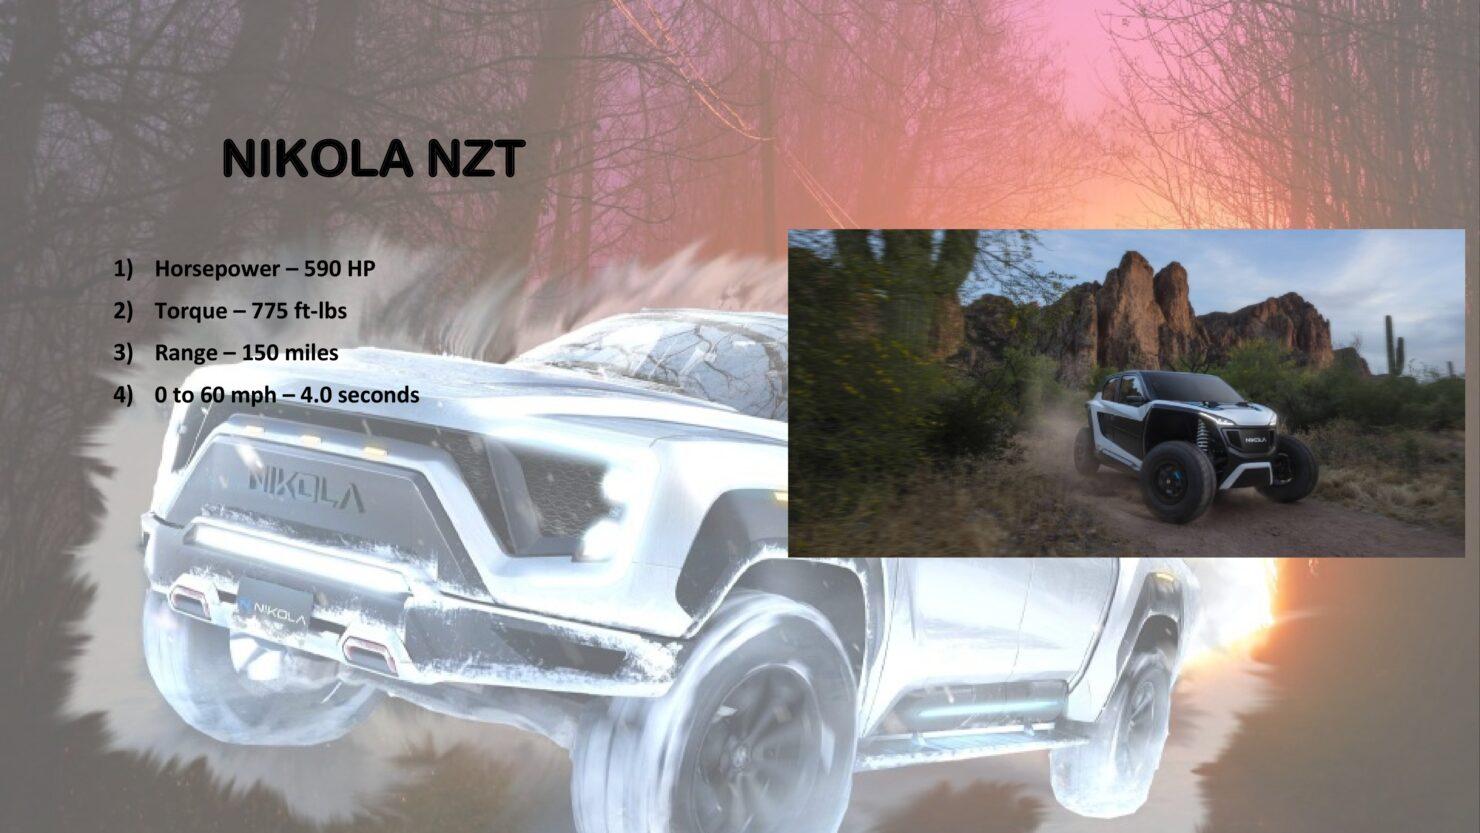 nikola-products-comparison-4